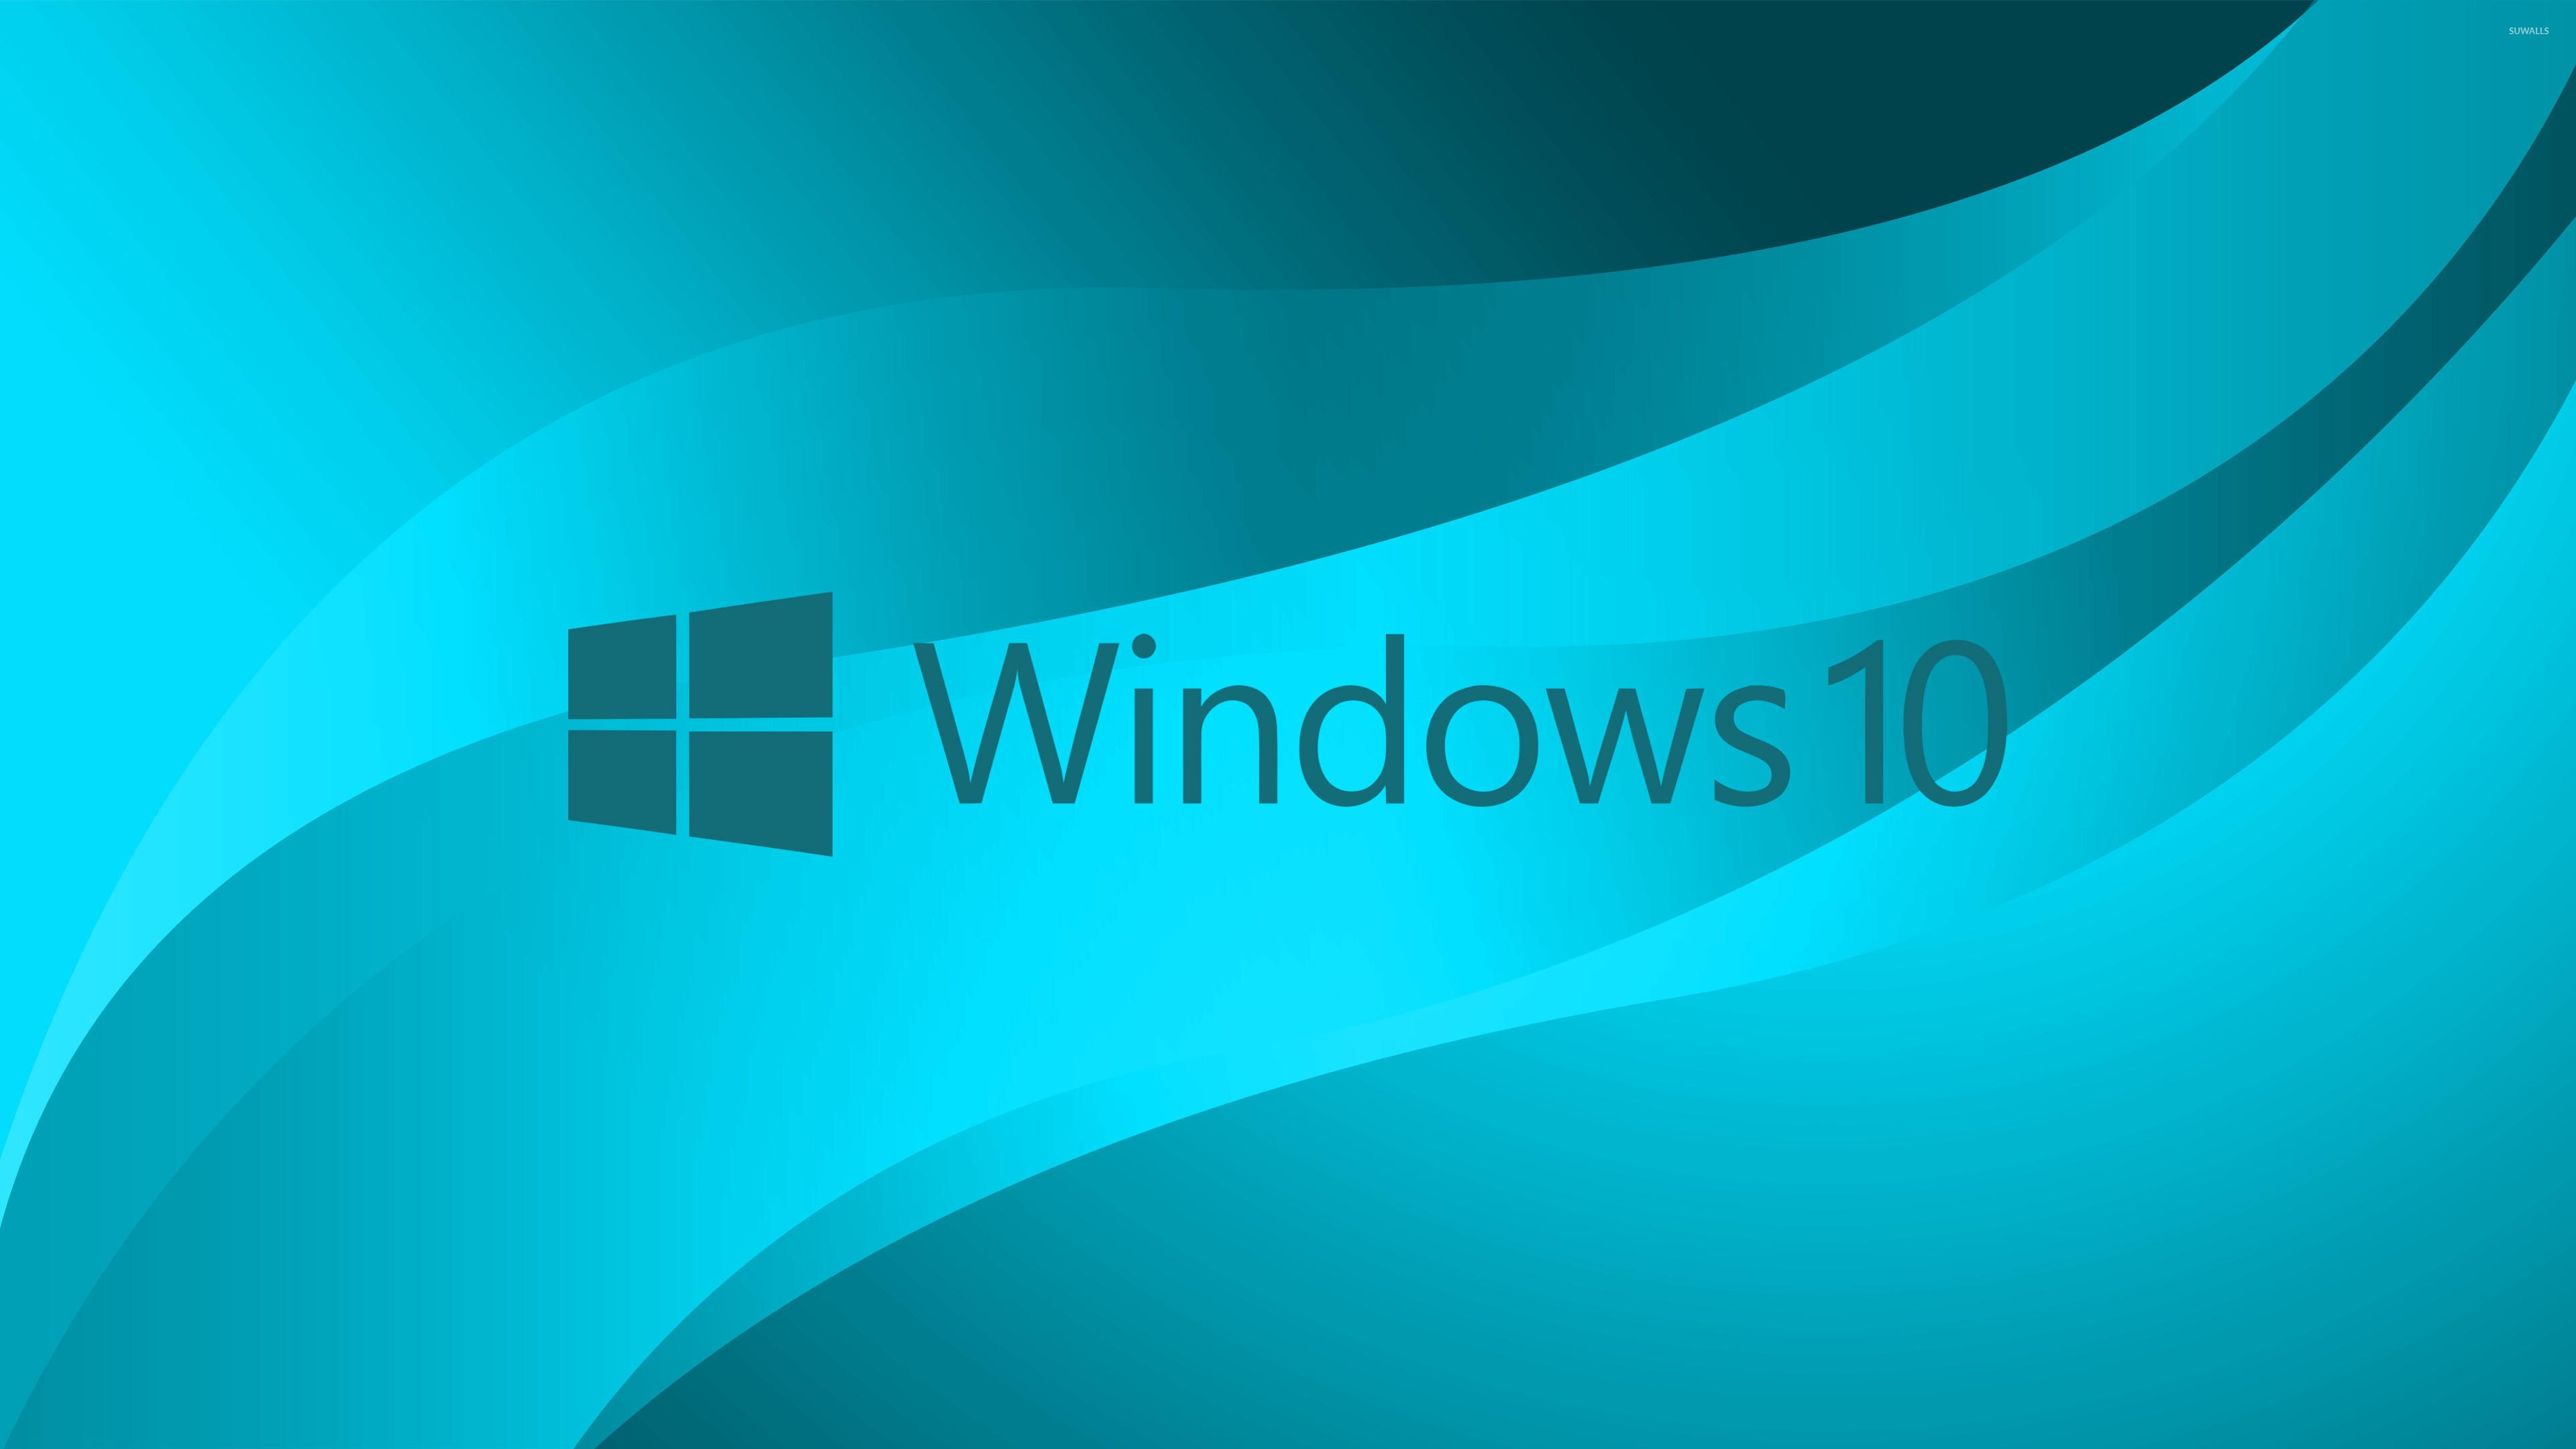 windows 10 wallpaper pack microsoft